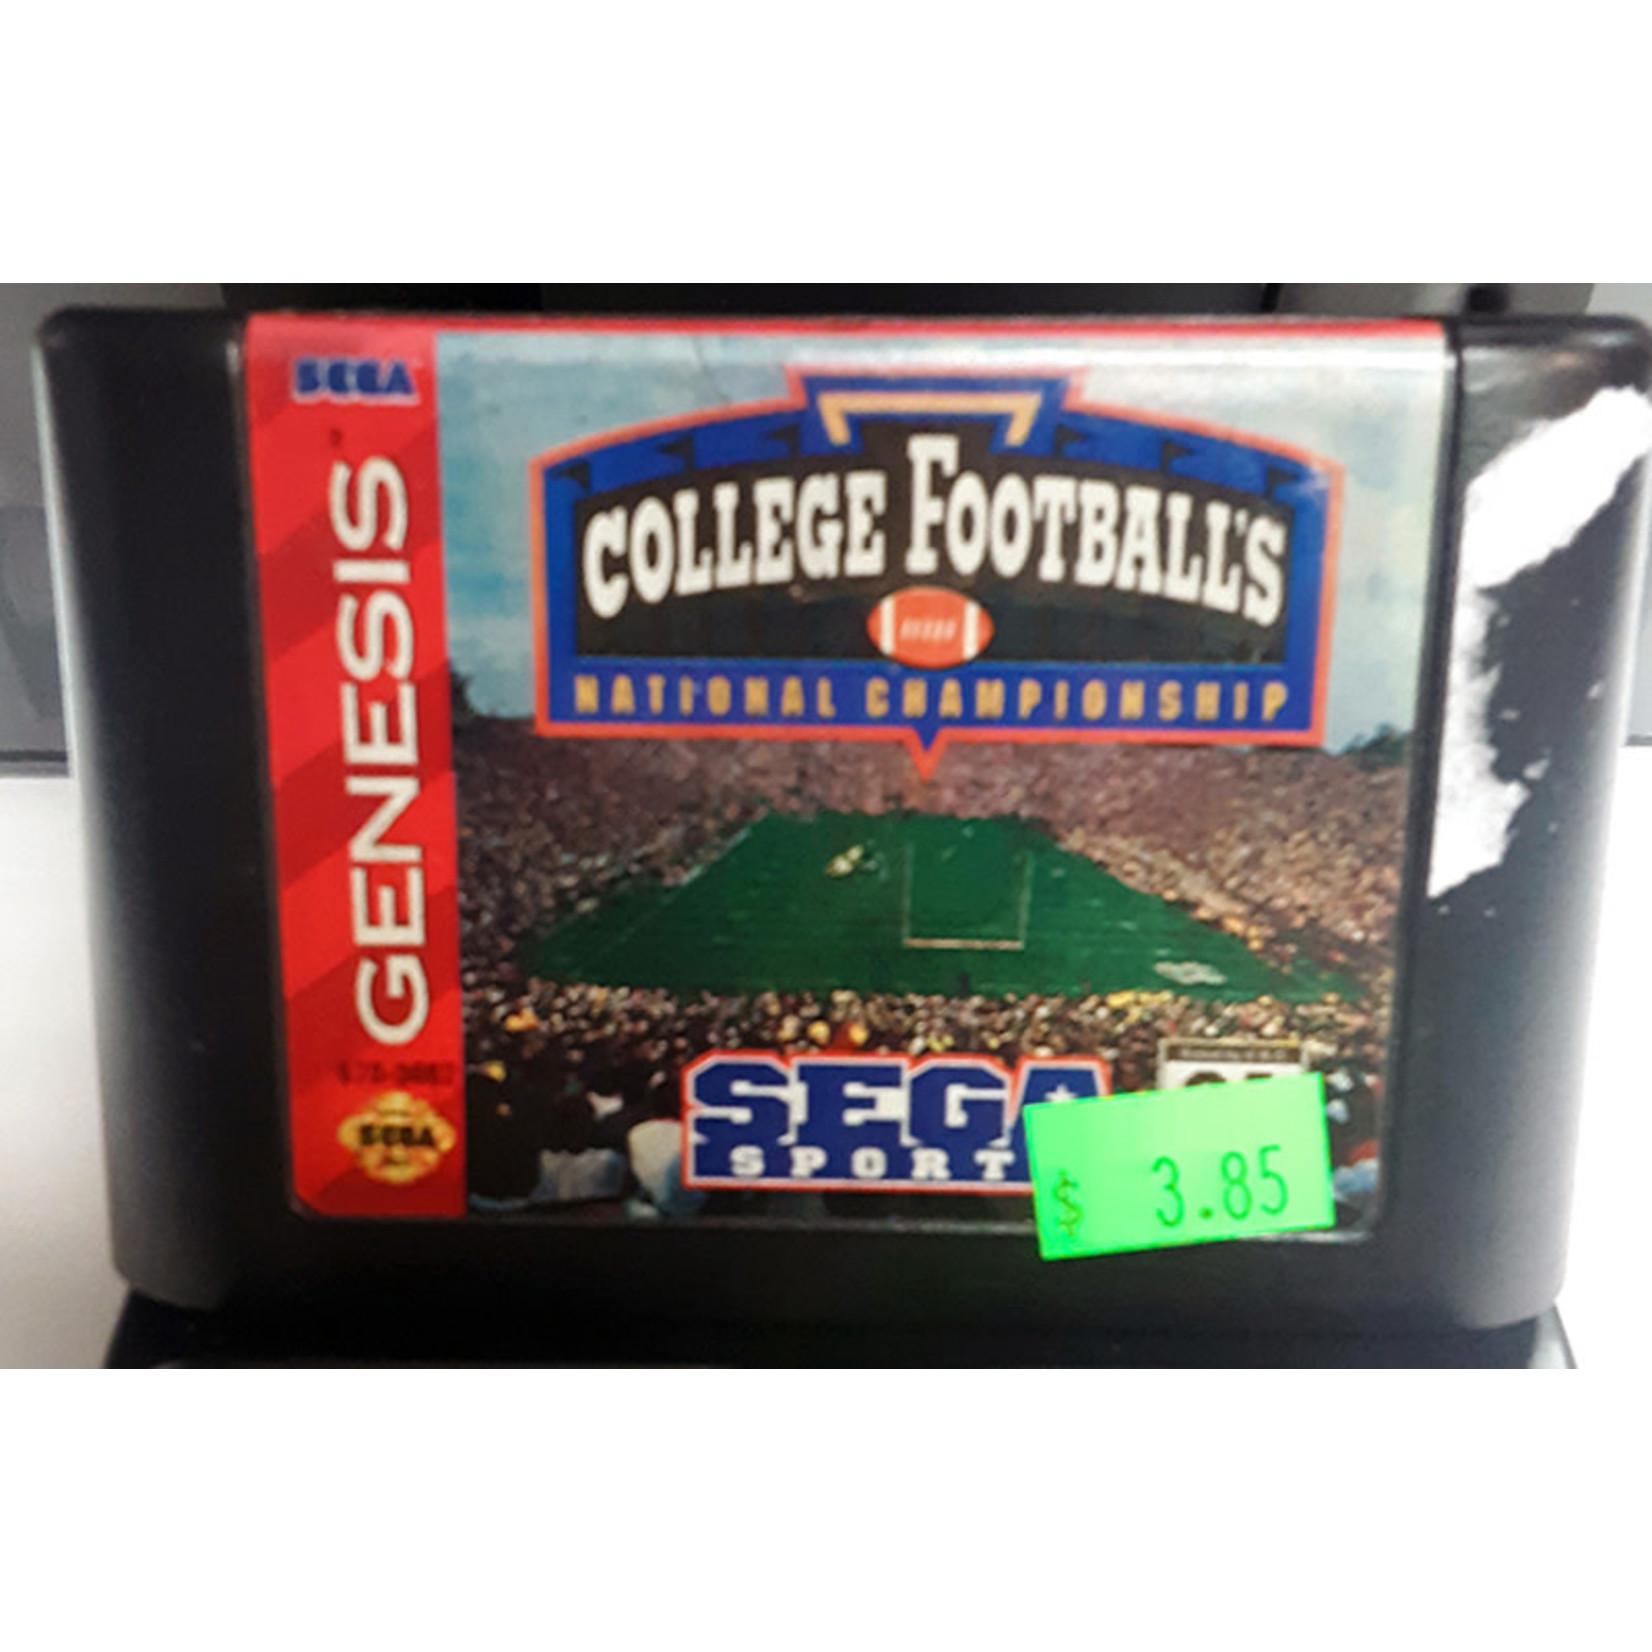 sgu-college football's national championship (cartridge)